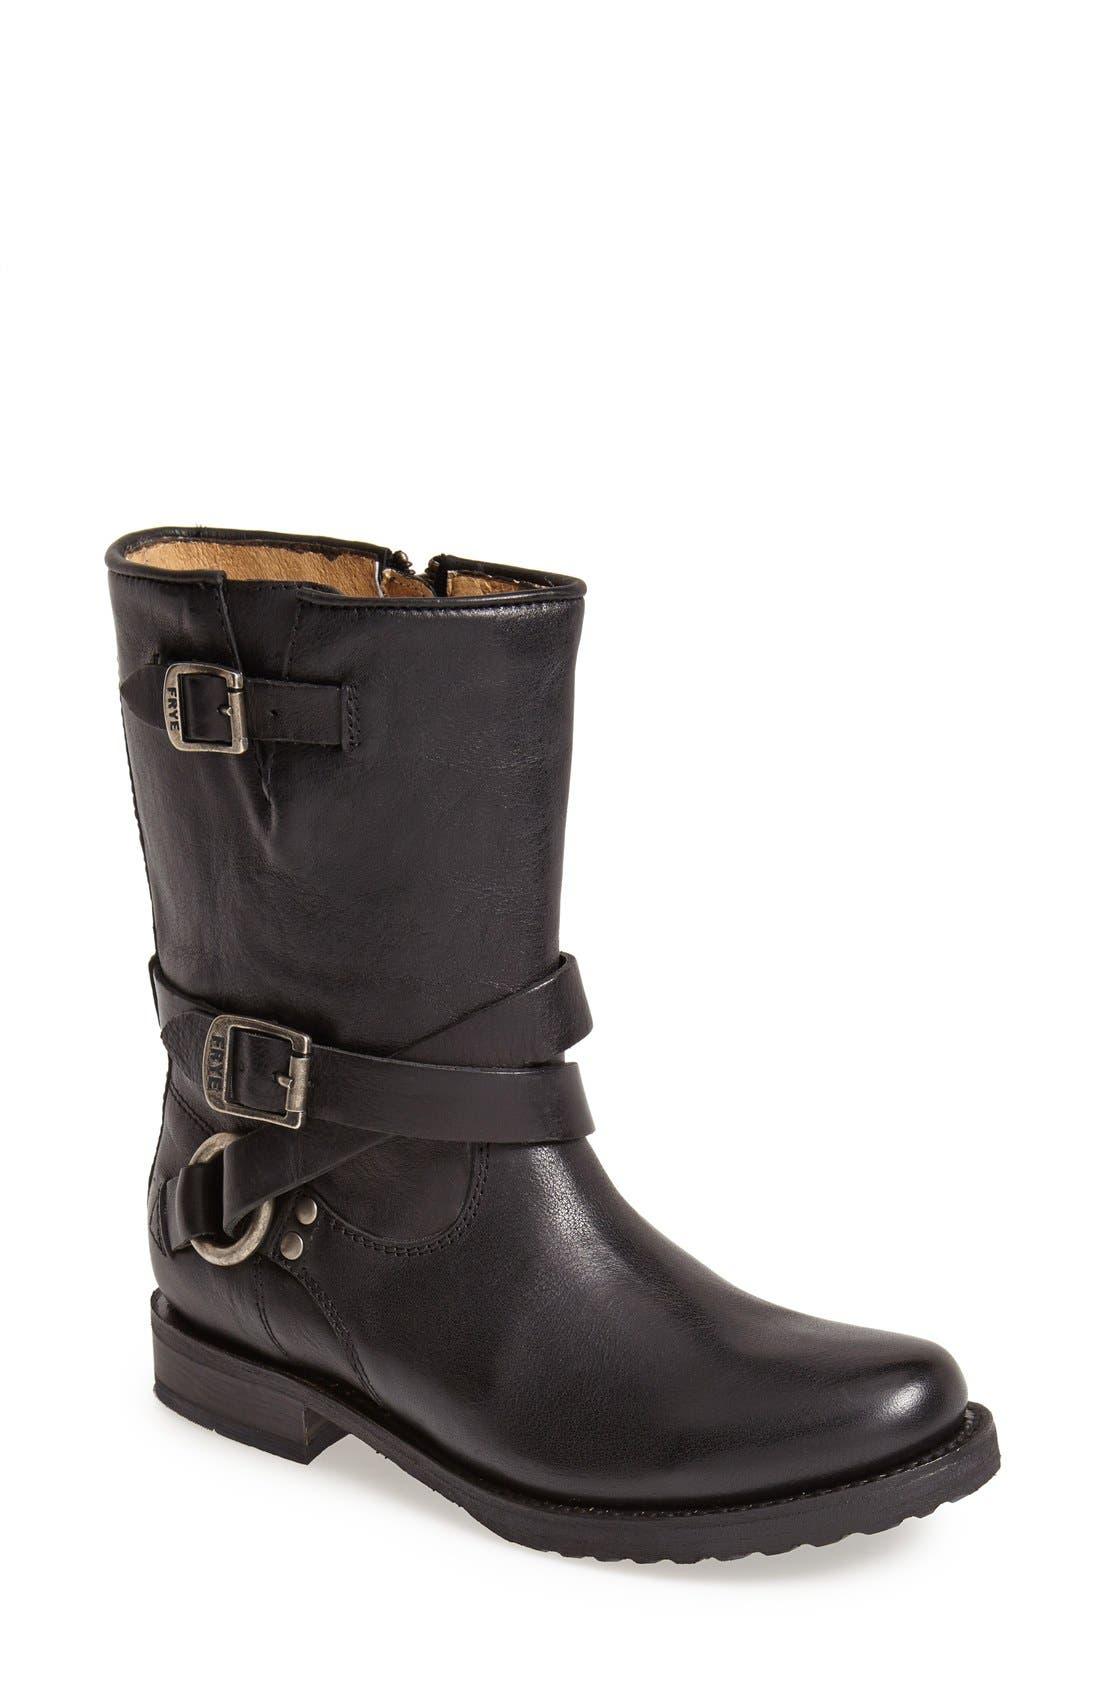 Alternate Image 1 Selected - Frye 'Veronica' Crisscross Strap Short Leather Boot (Women)